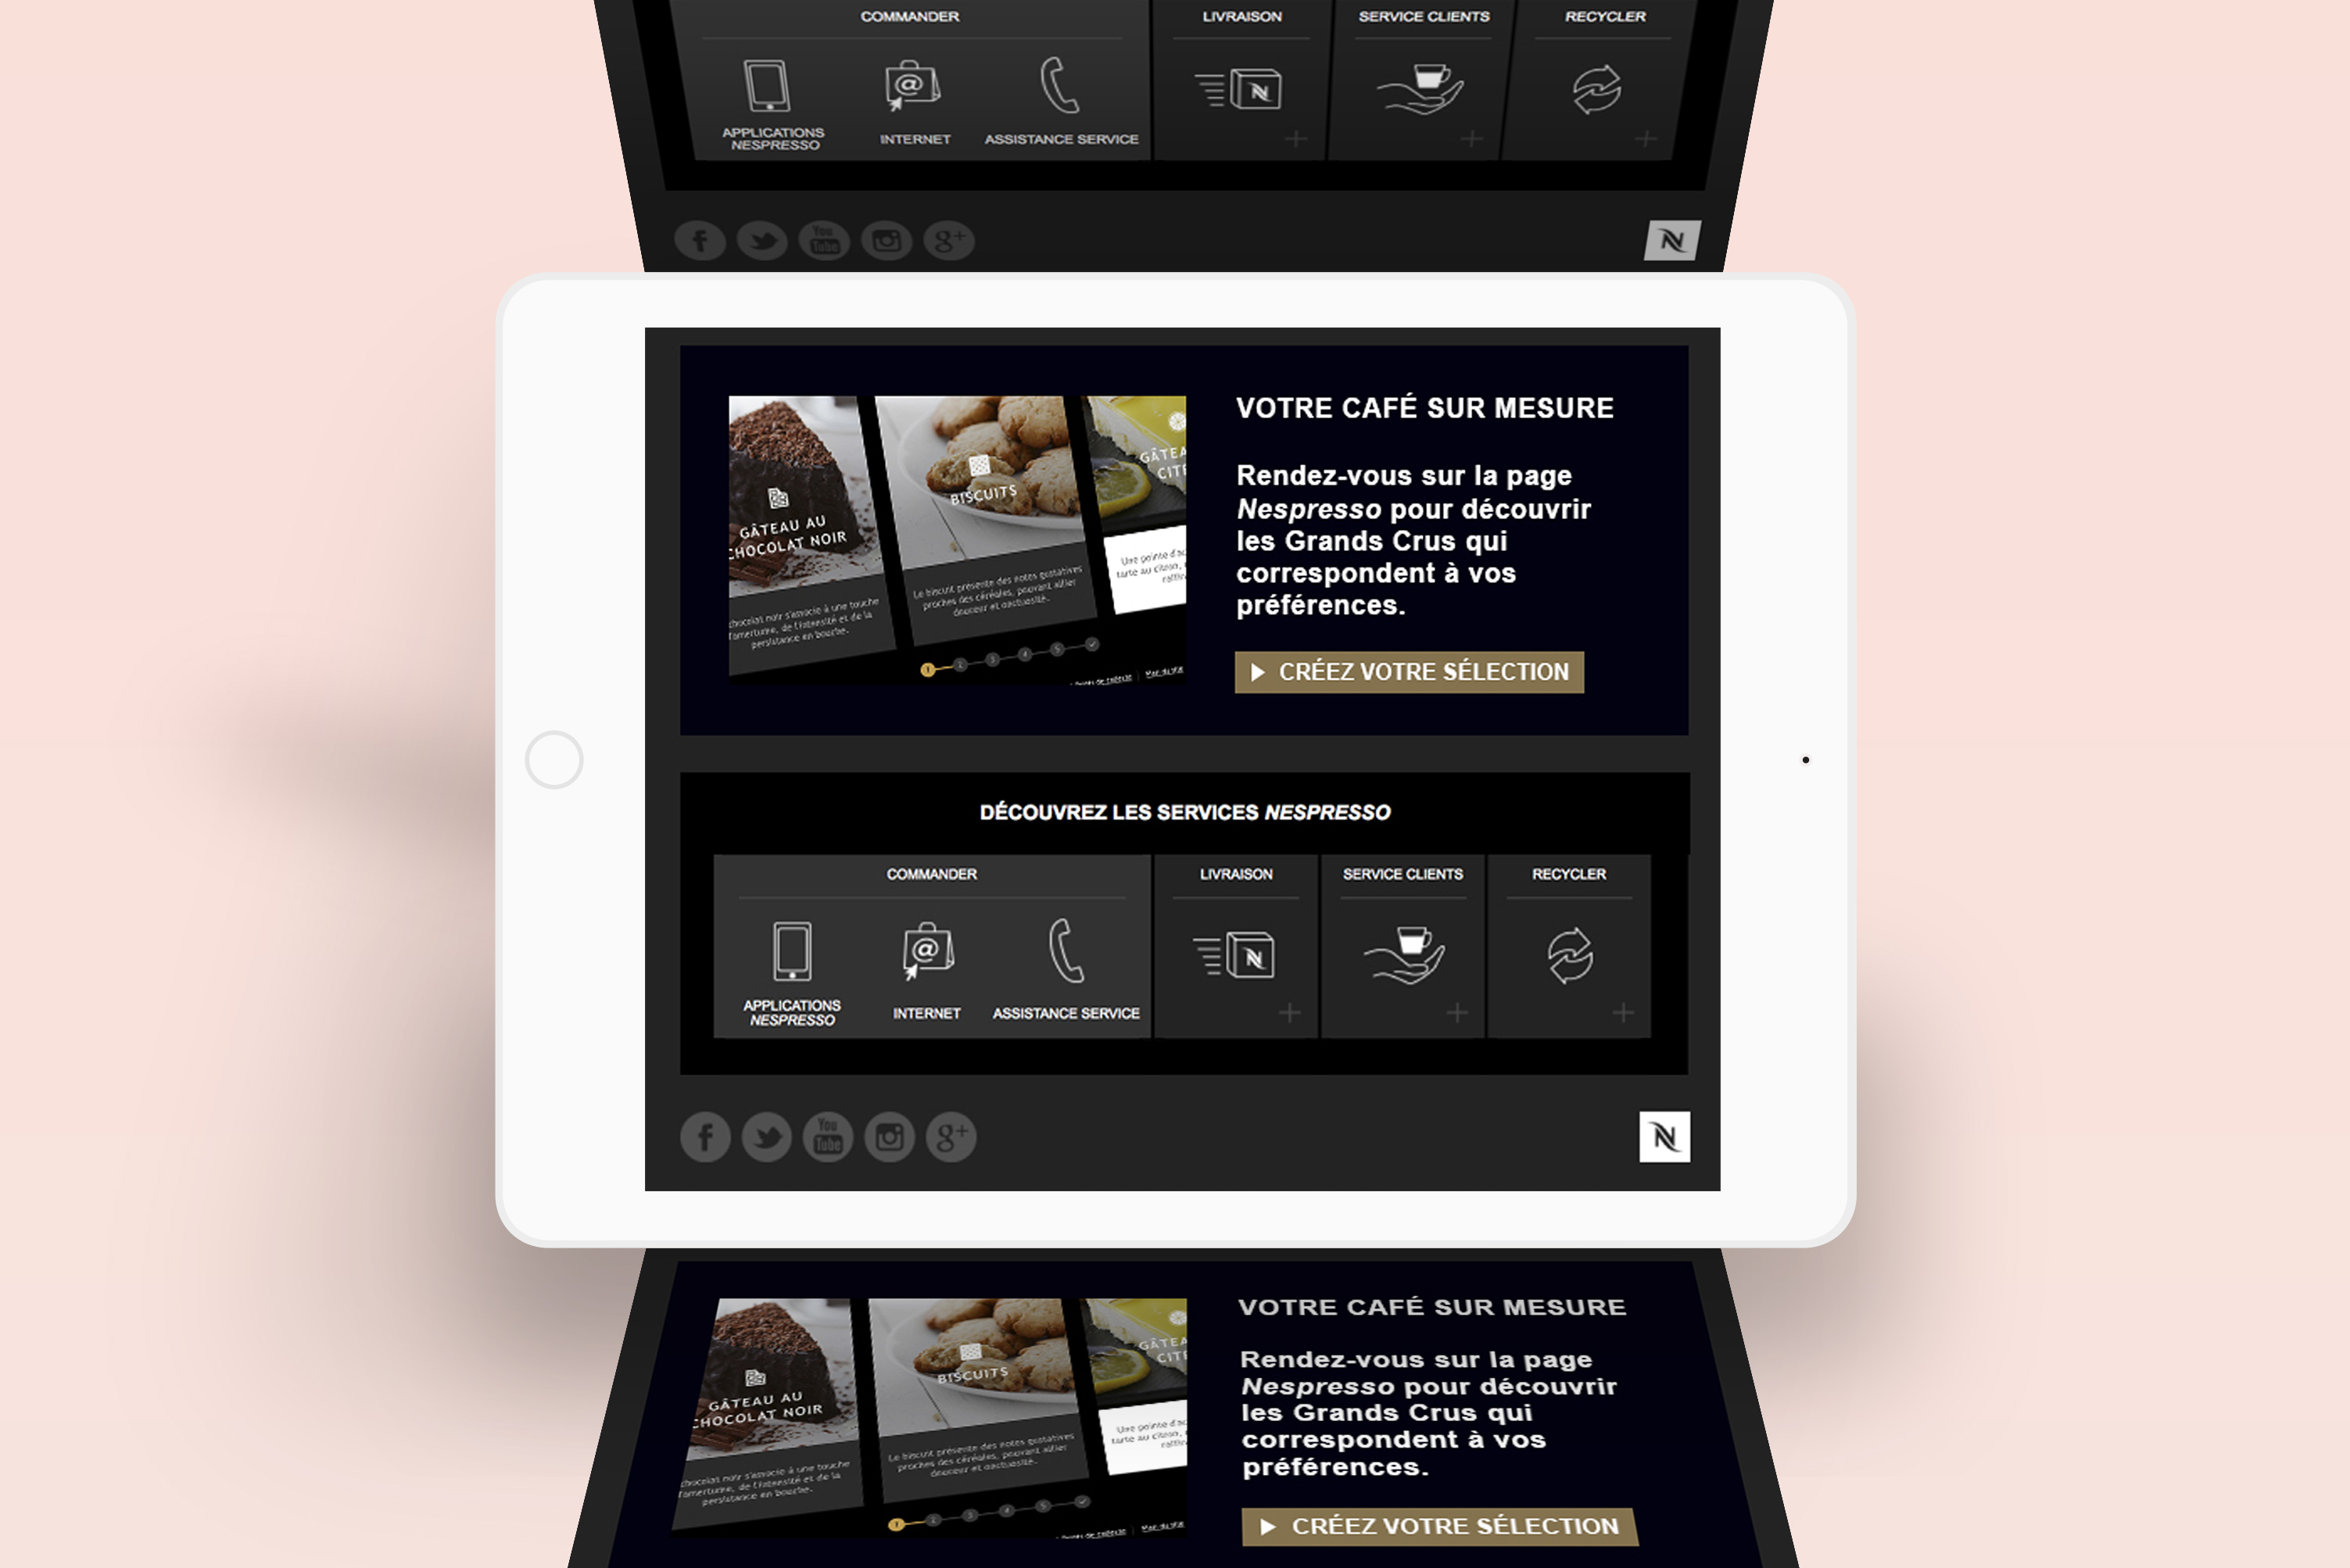 Nespresso web design - Newsletter